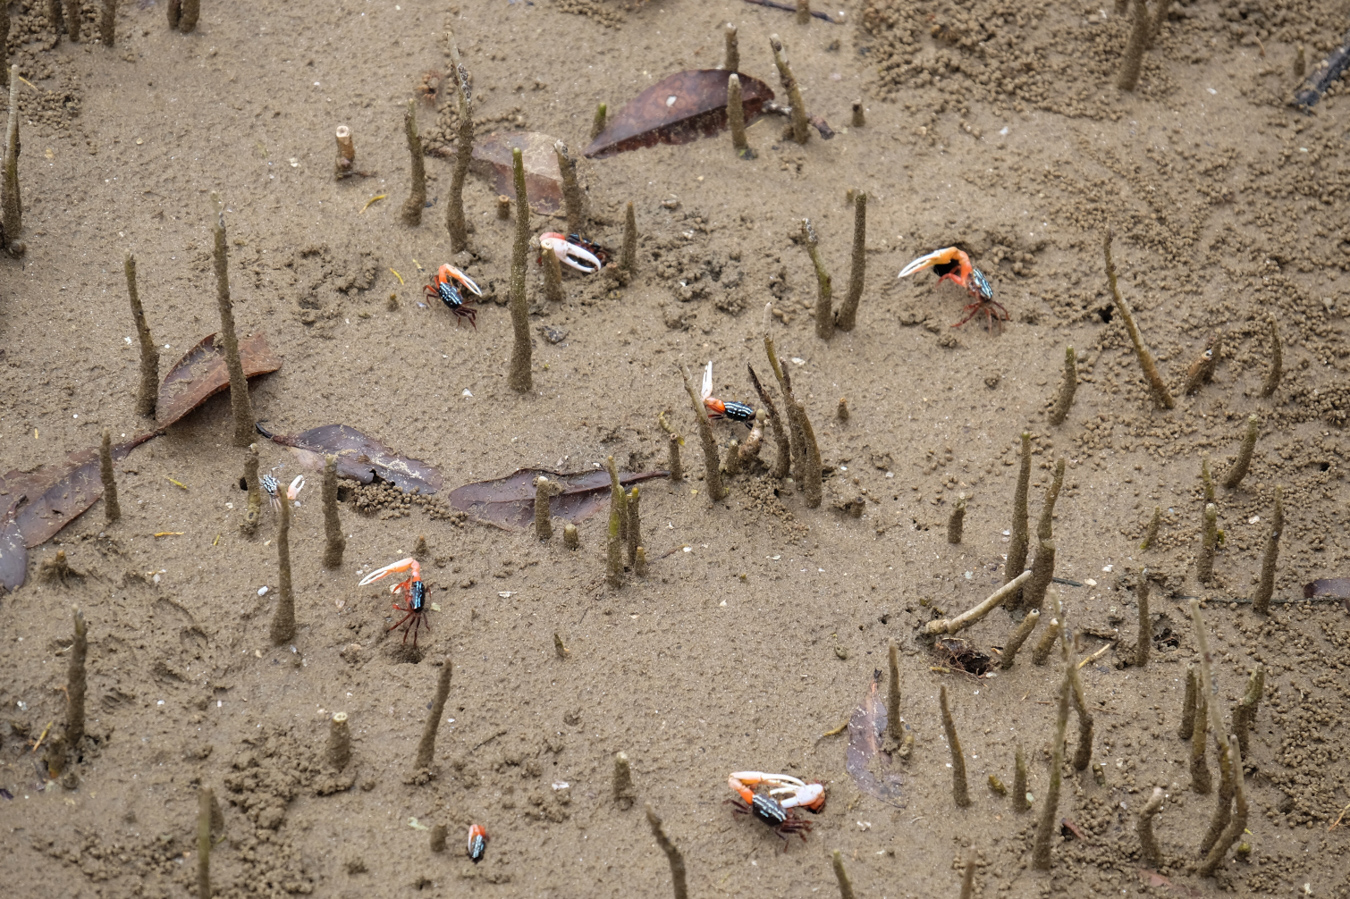 Erst beim zweiten oder dritten Hinschauen, bemerken wir, das unter uns alles voller Krabben ist